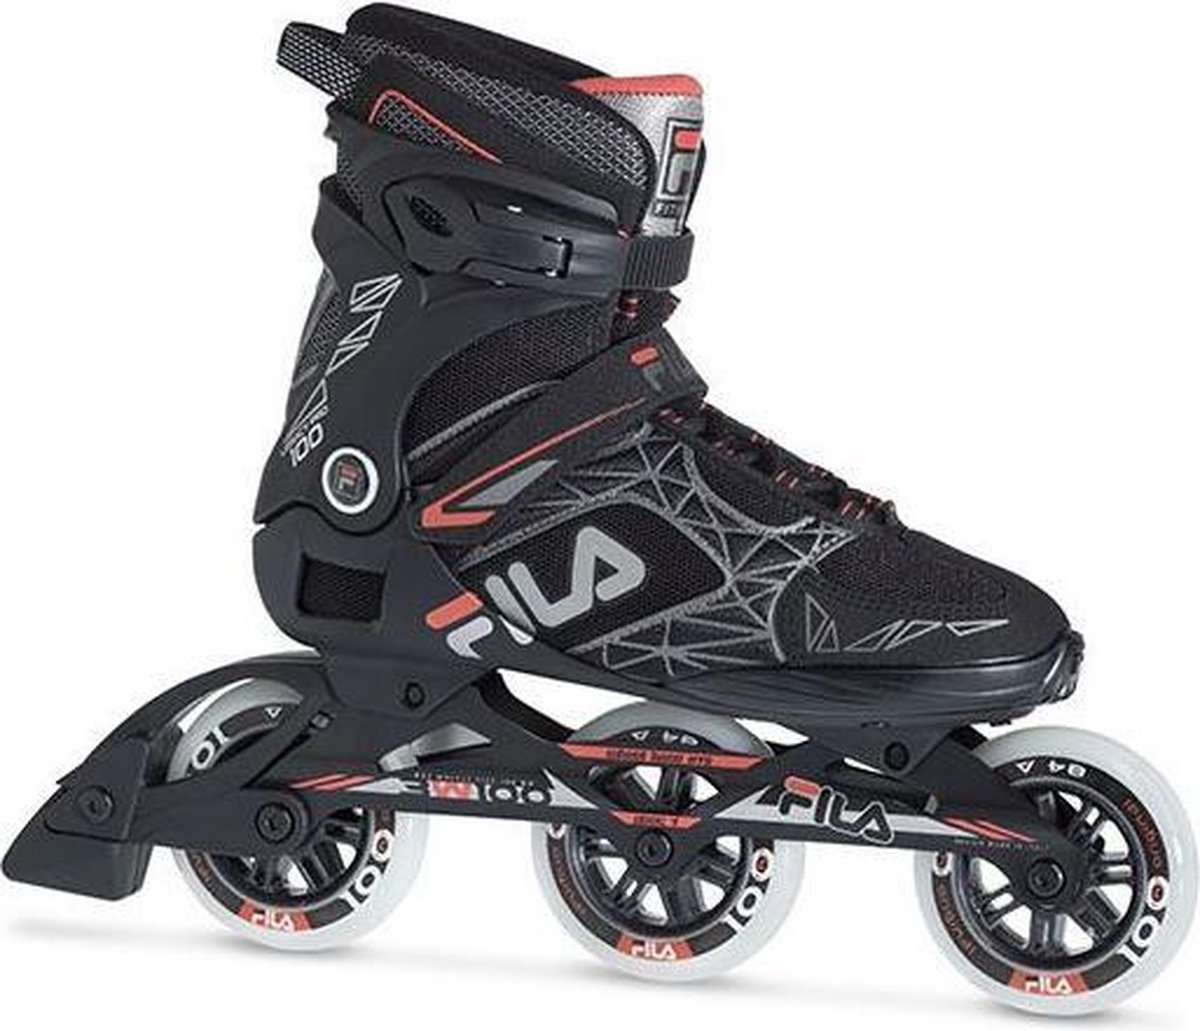 Fila Legacy pro inline skates 100 mm black red